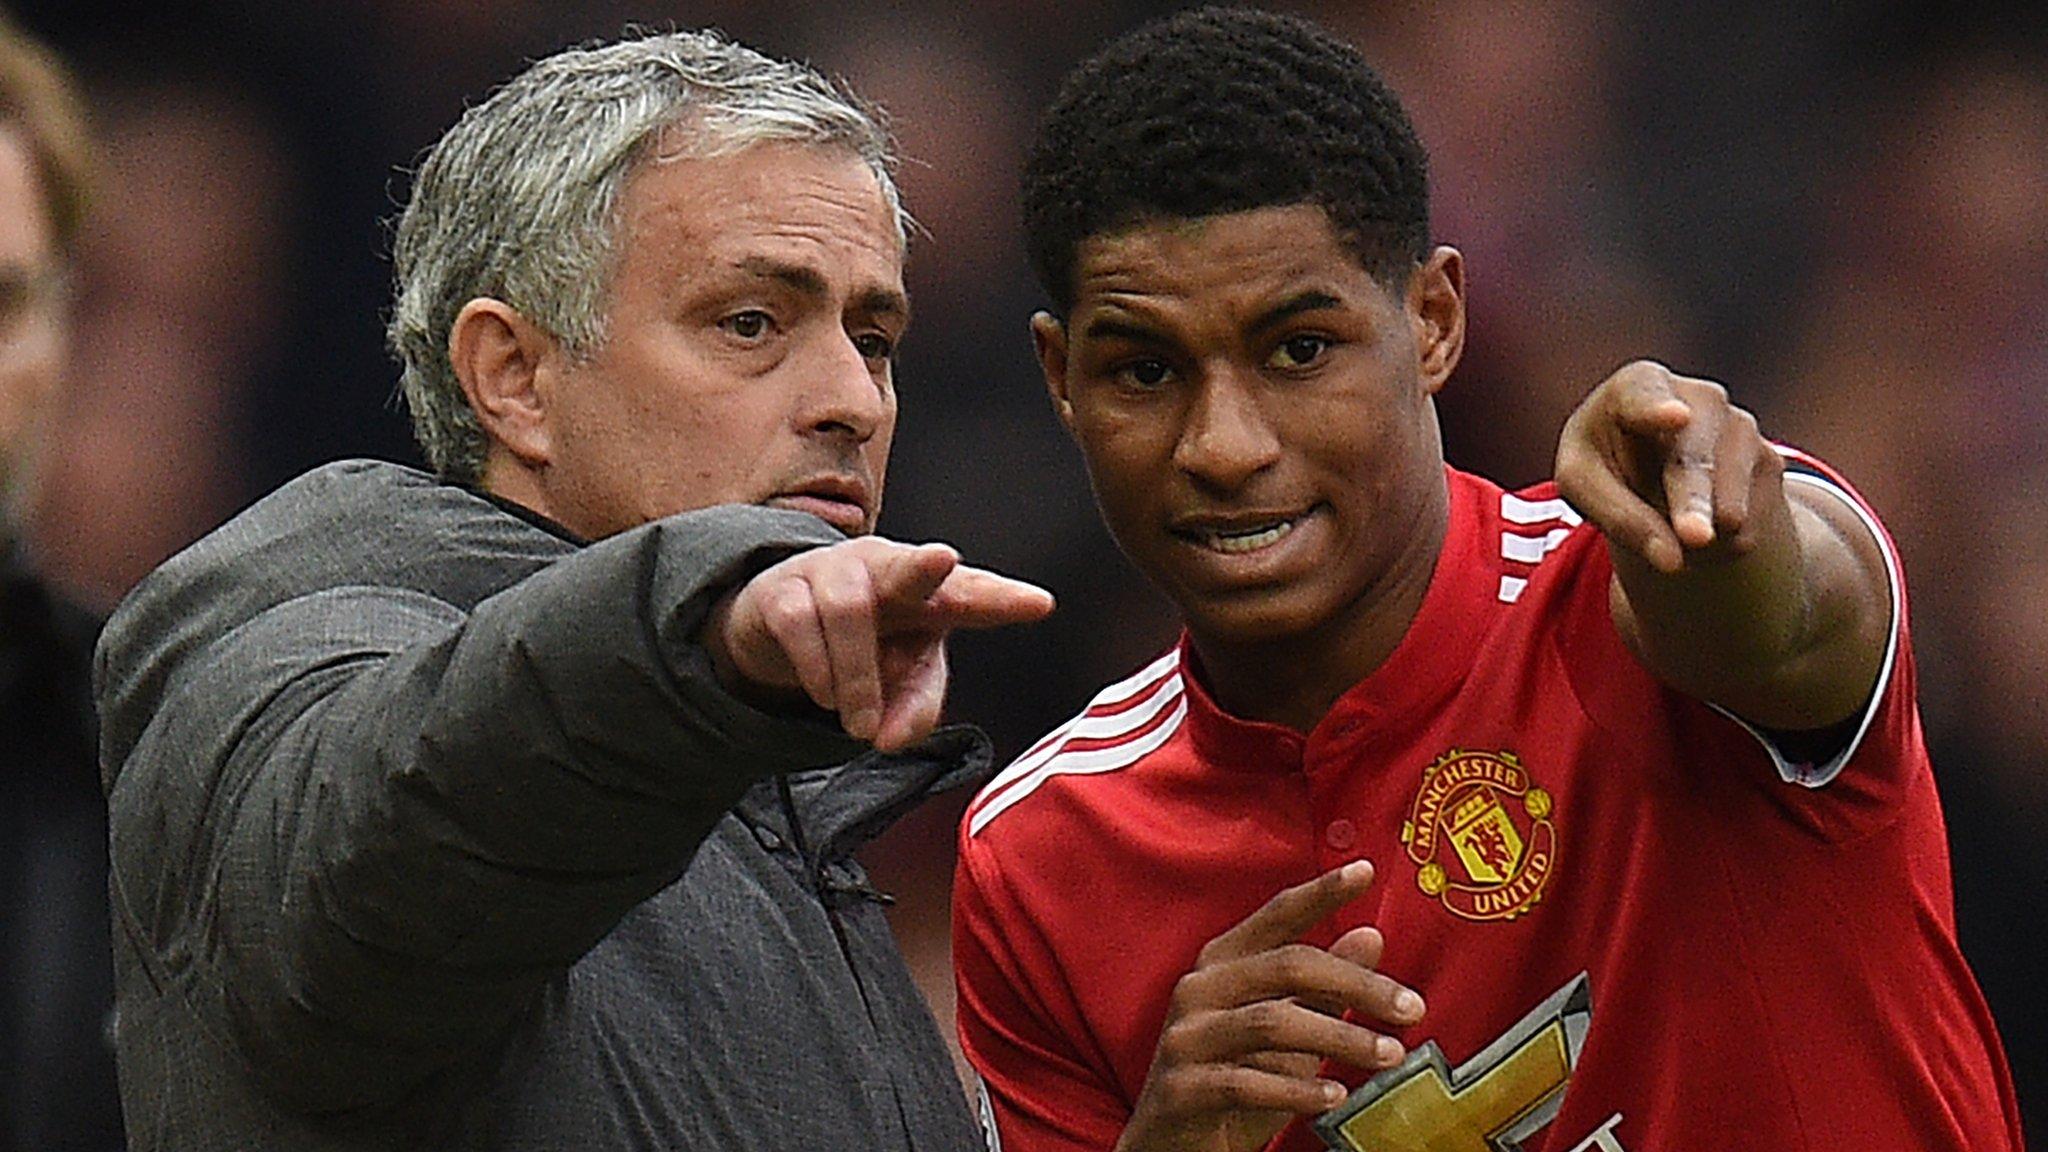 Mourinho defends Rashford's Man Utd playing time